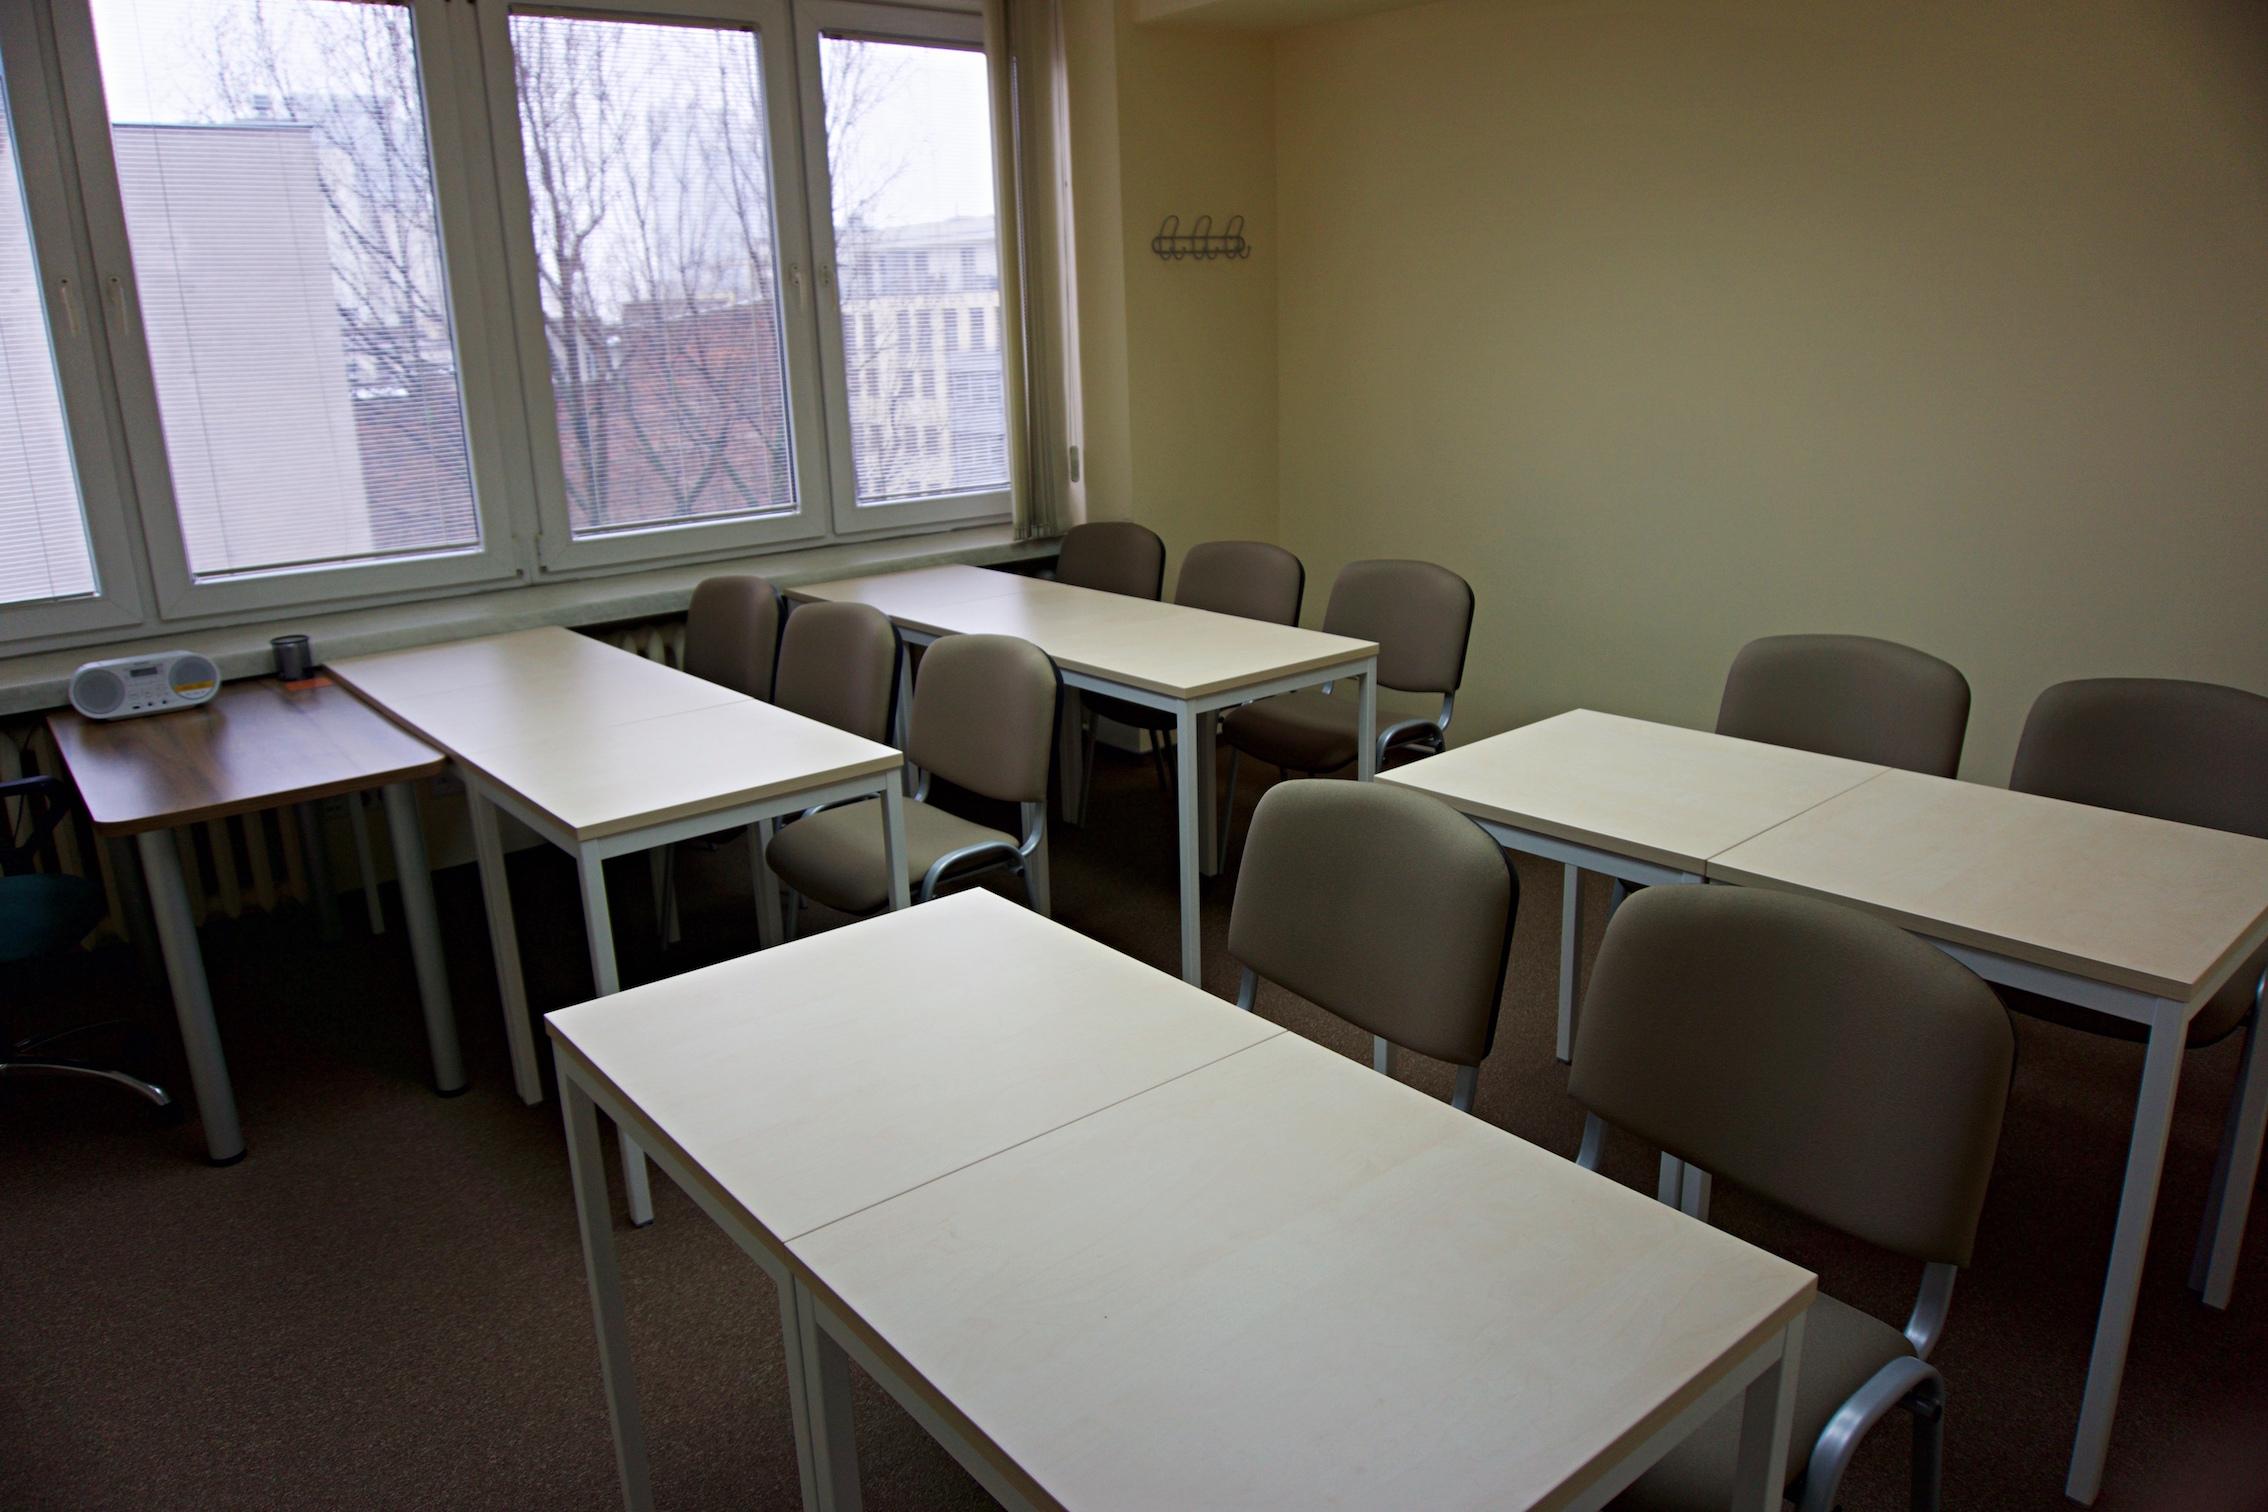 ILSP classroom